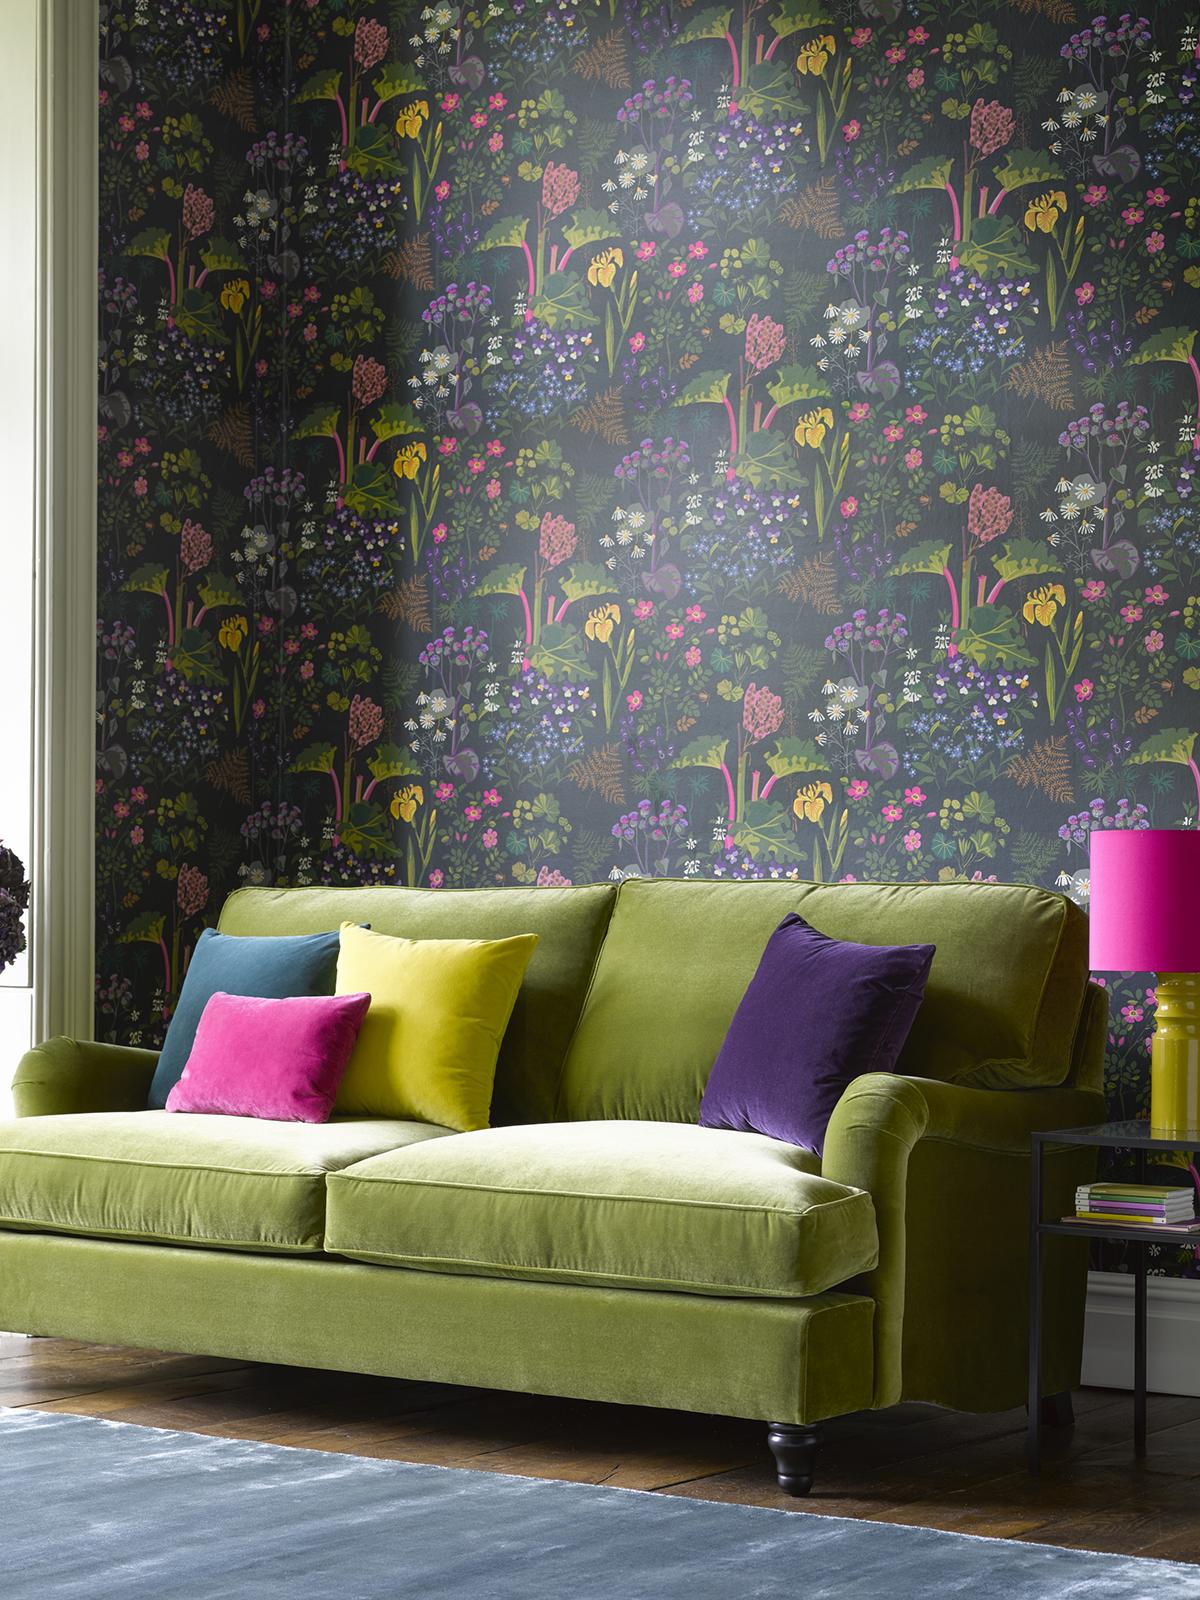 Should you buy a velvet sofa? – Sophie Robinson